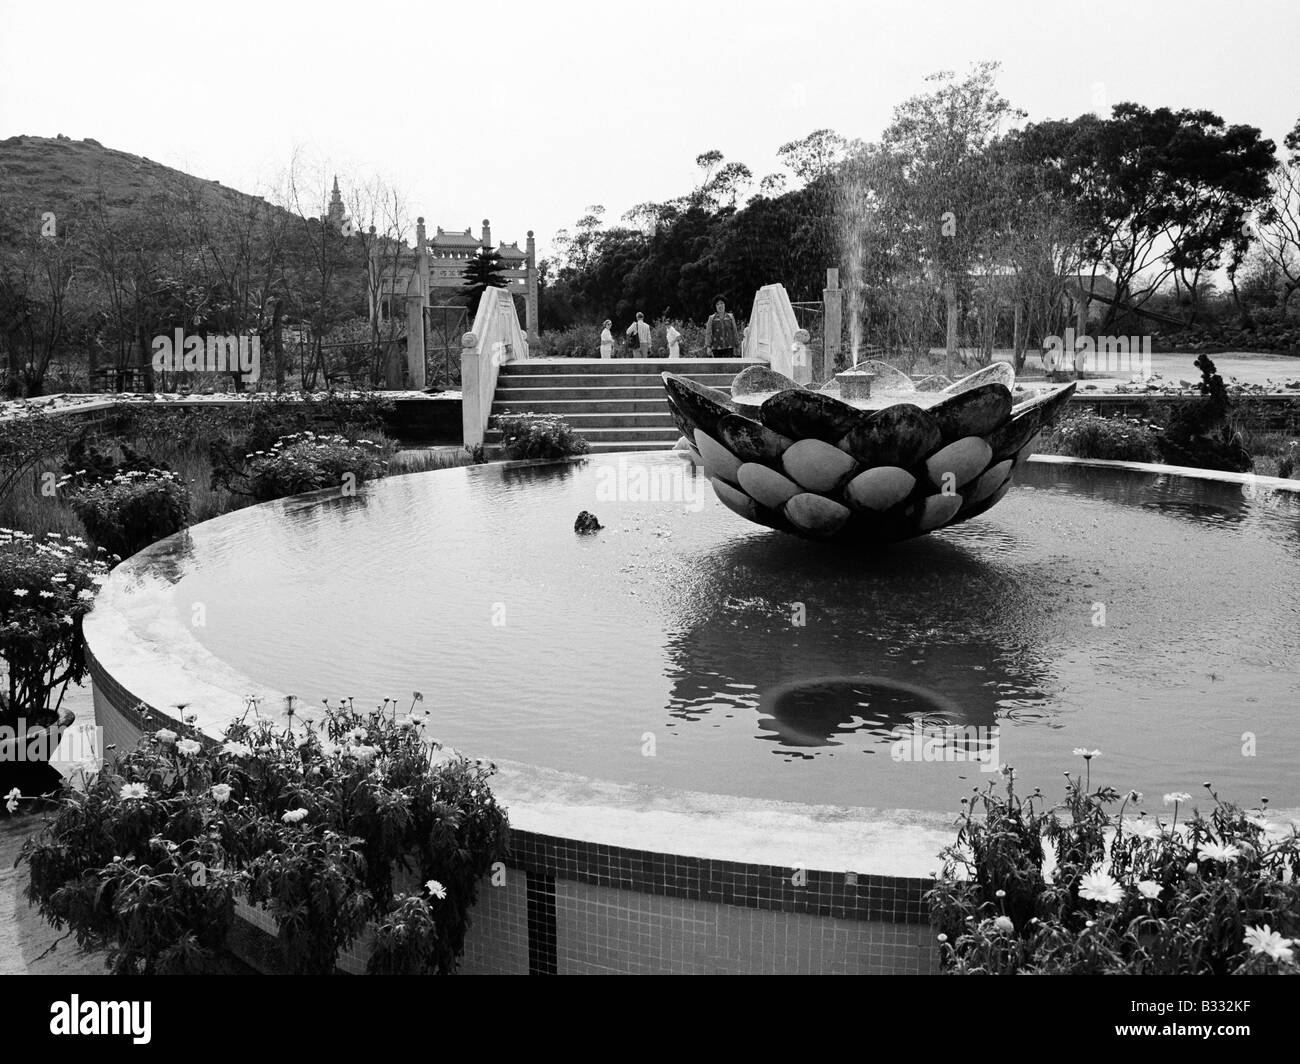 Lotus flower china black and white stock photos images alamy lotus flower fountain at po lin buddhist monastery lantau island hong kong 1979 stock image izmirmasajfo